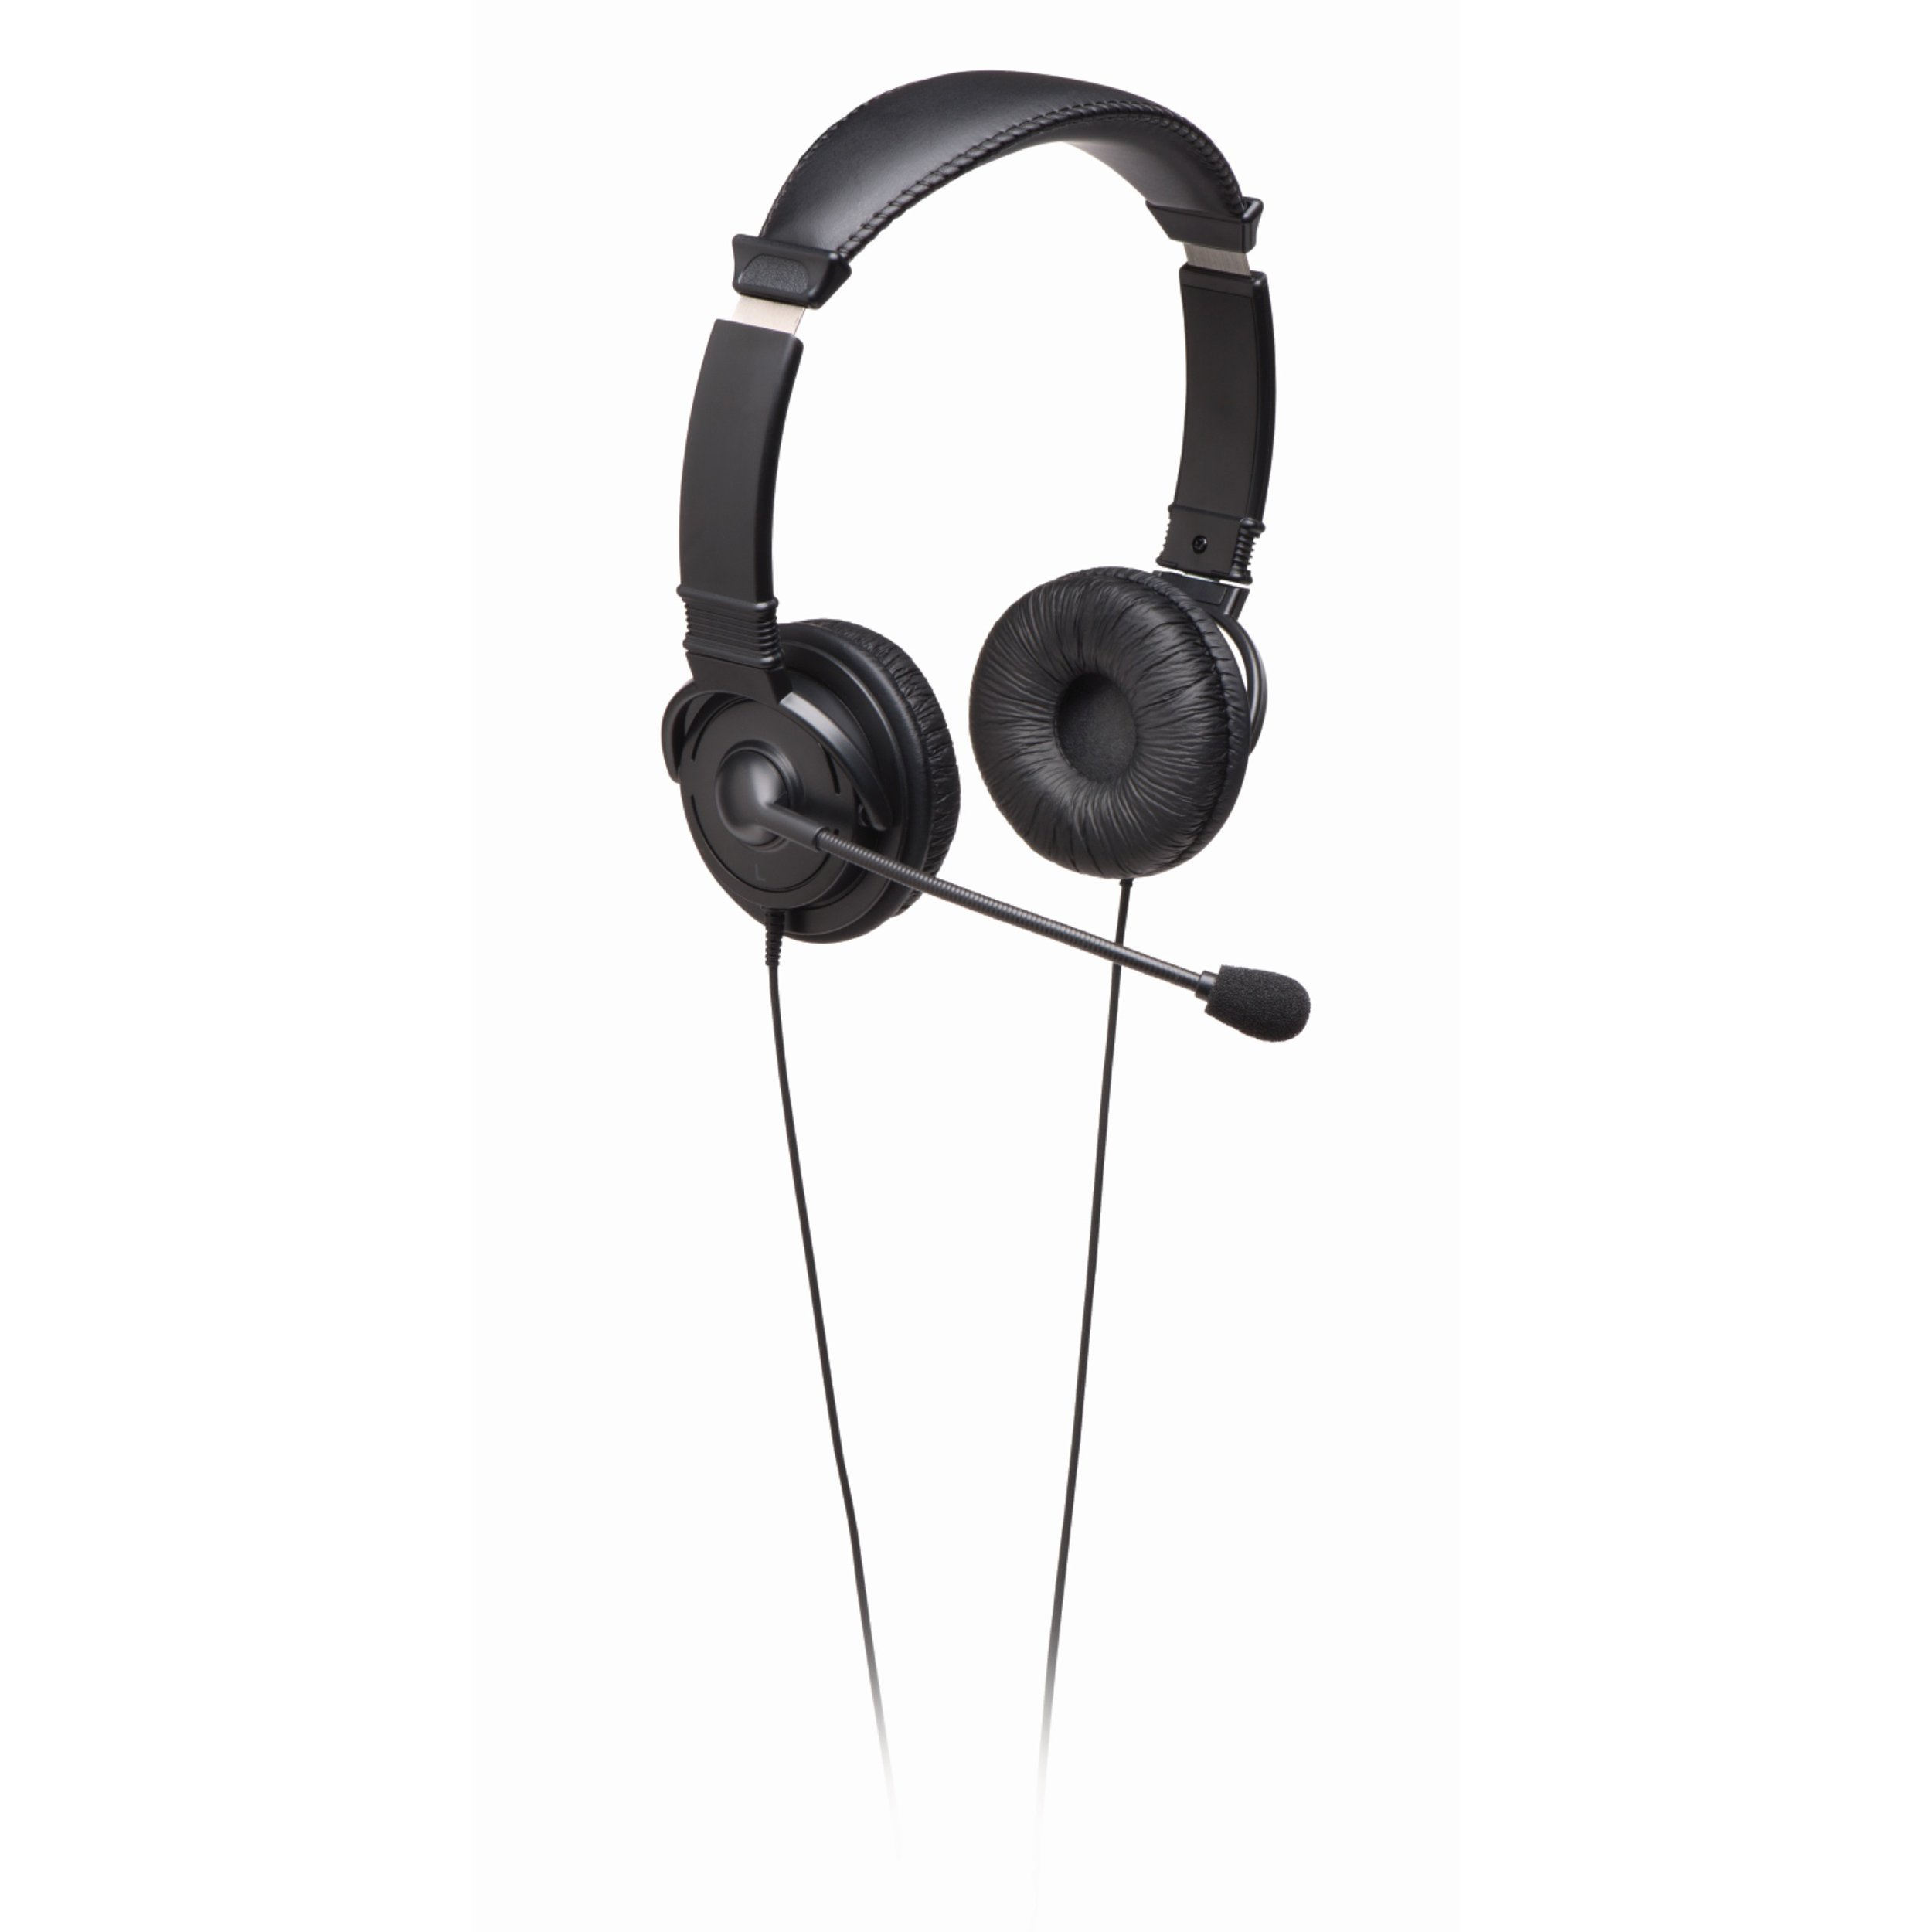 Kensington Hi-Fi On-Ear Headphones with Mic and 9-Foot Cord (K33323WW)